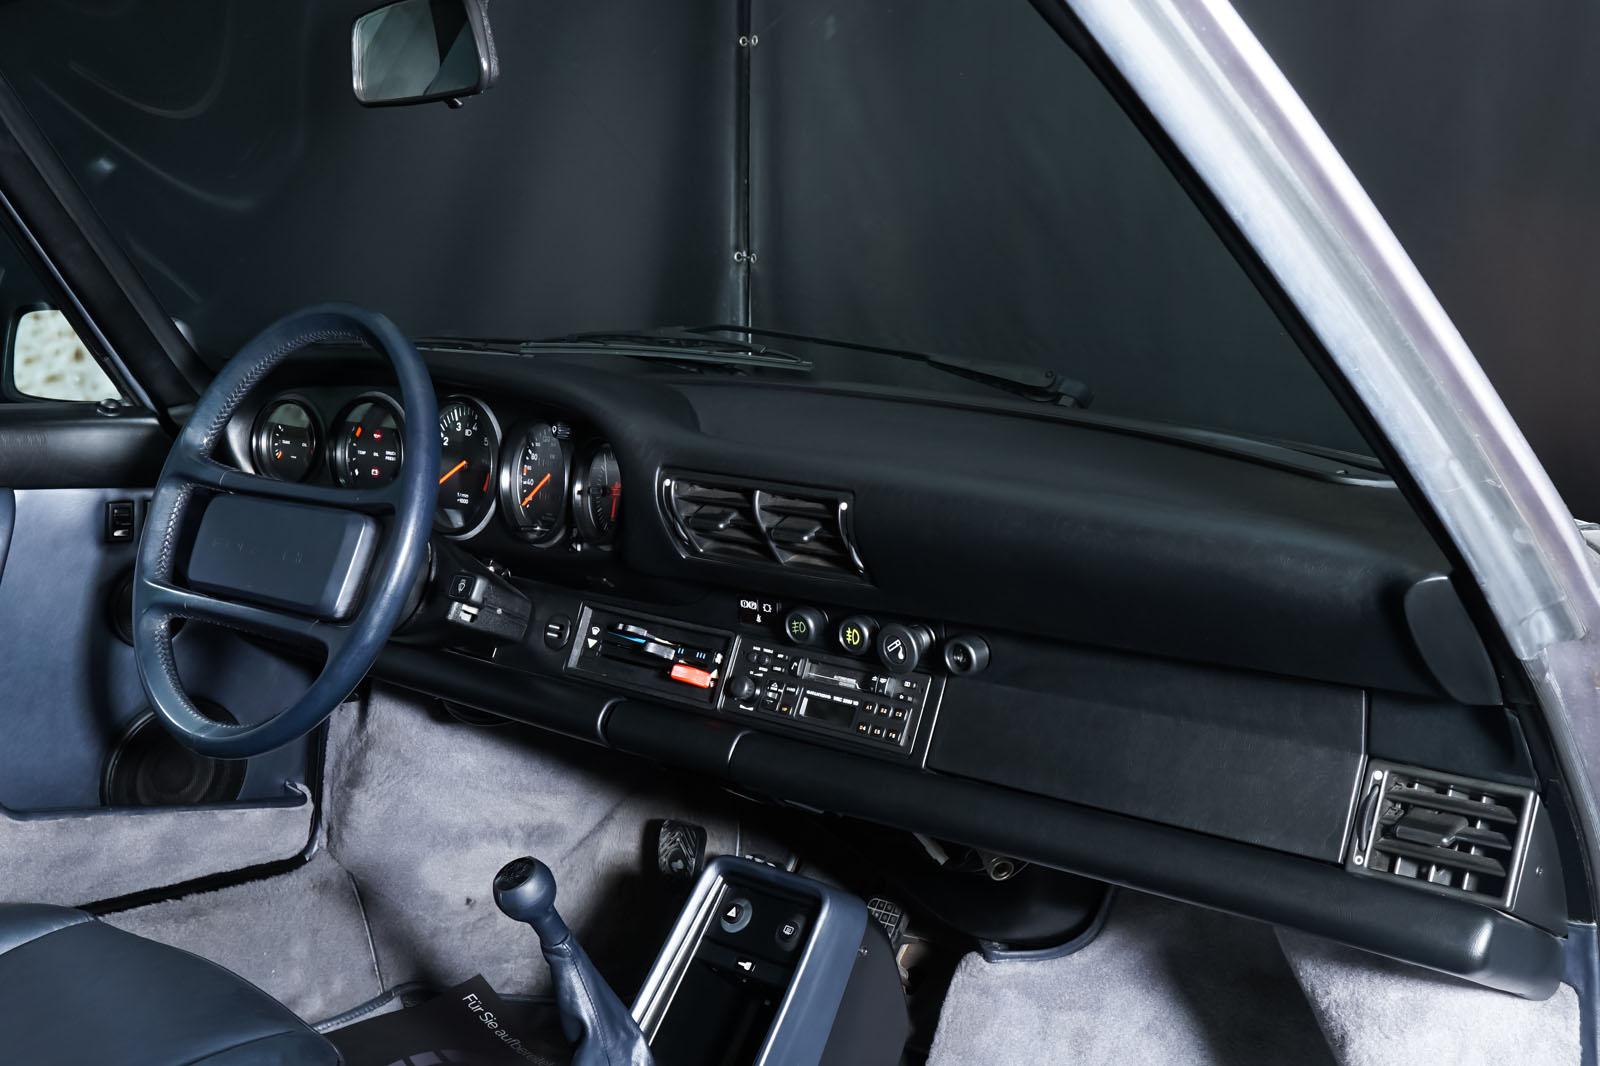 Porsche_911_Targa_Diamantblaumetallic_Blau_POR-0092_17_w